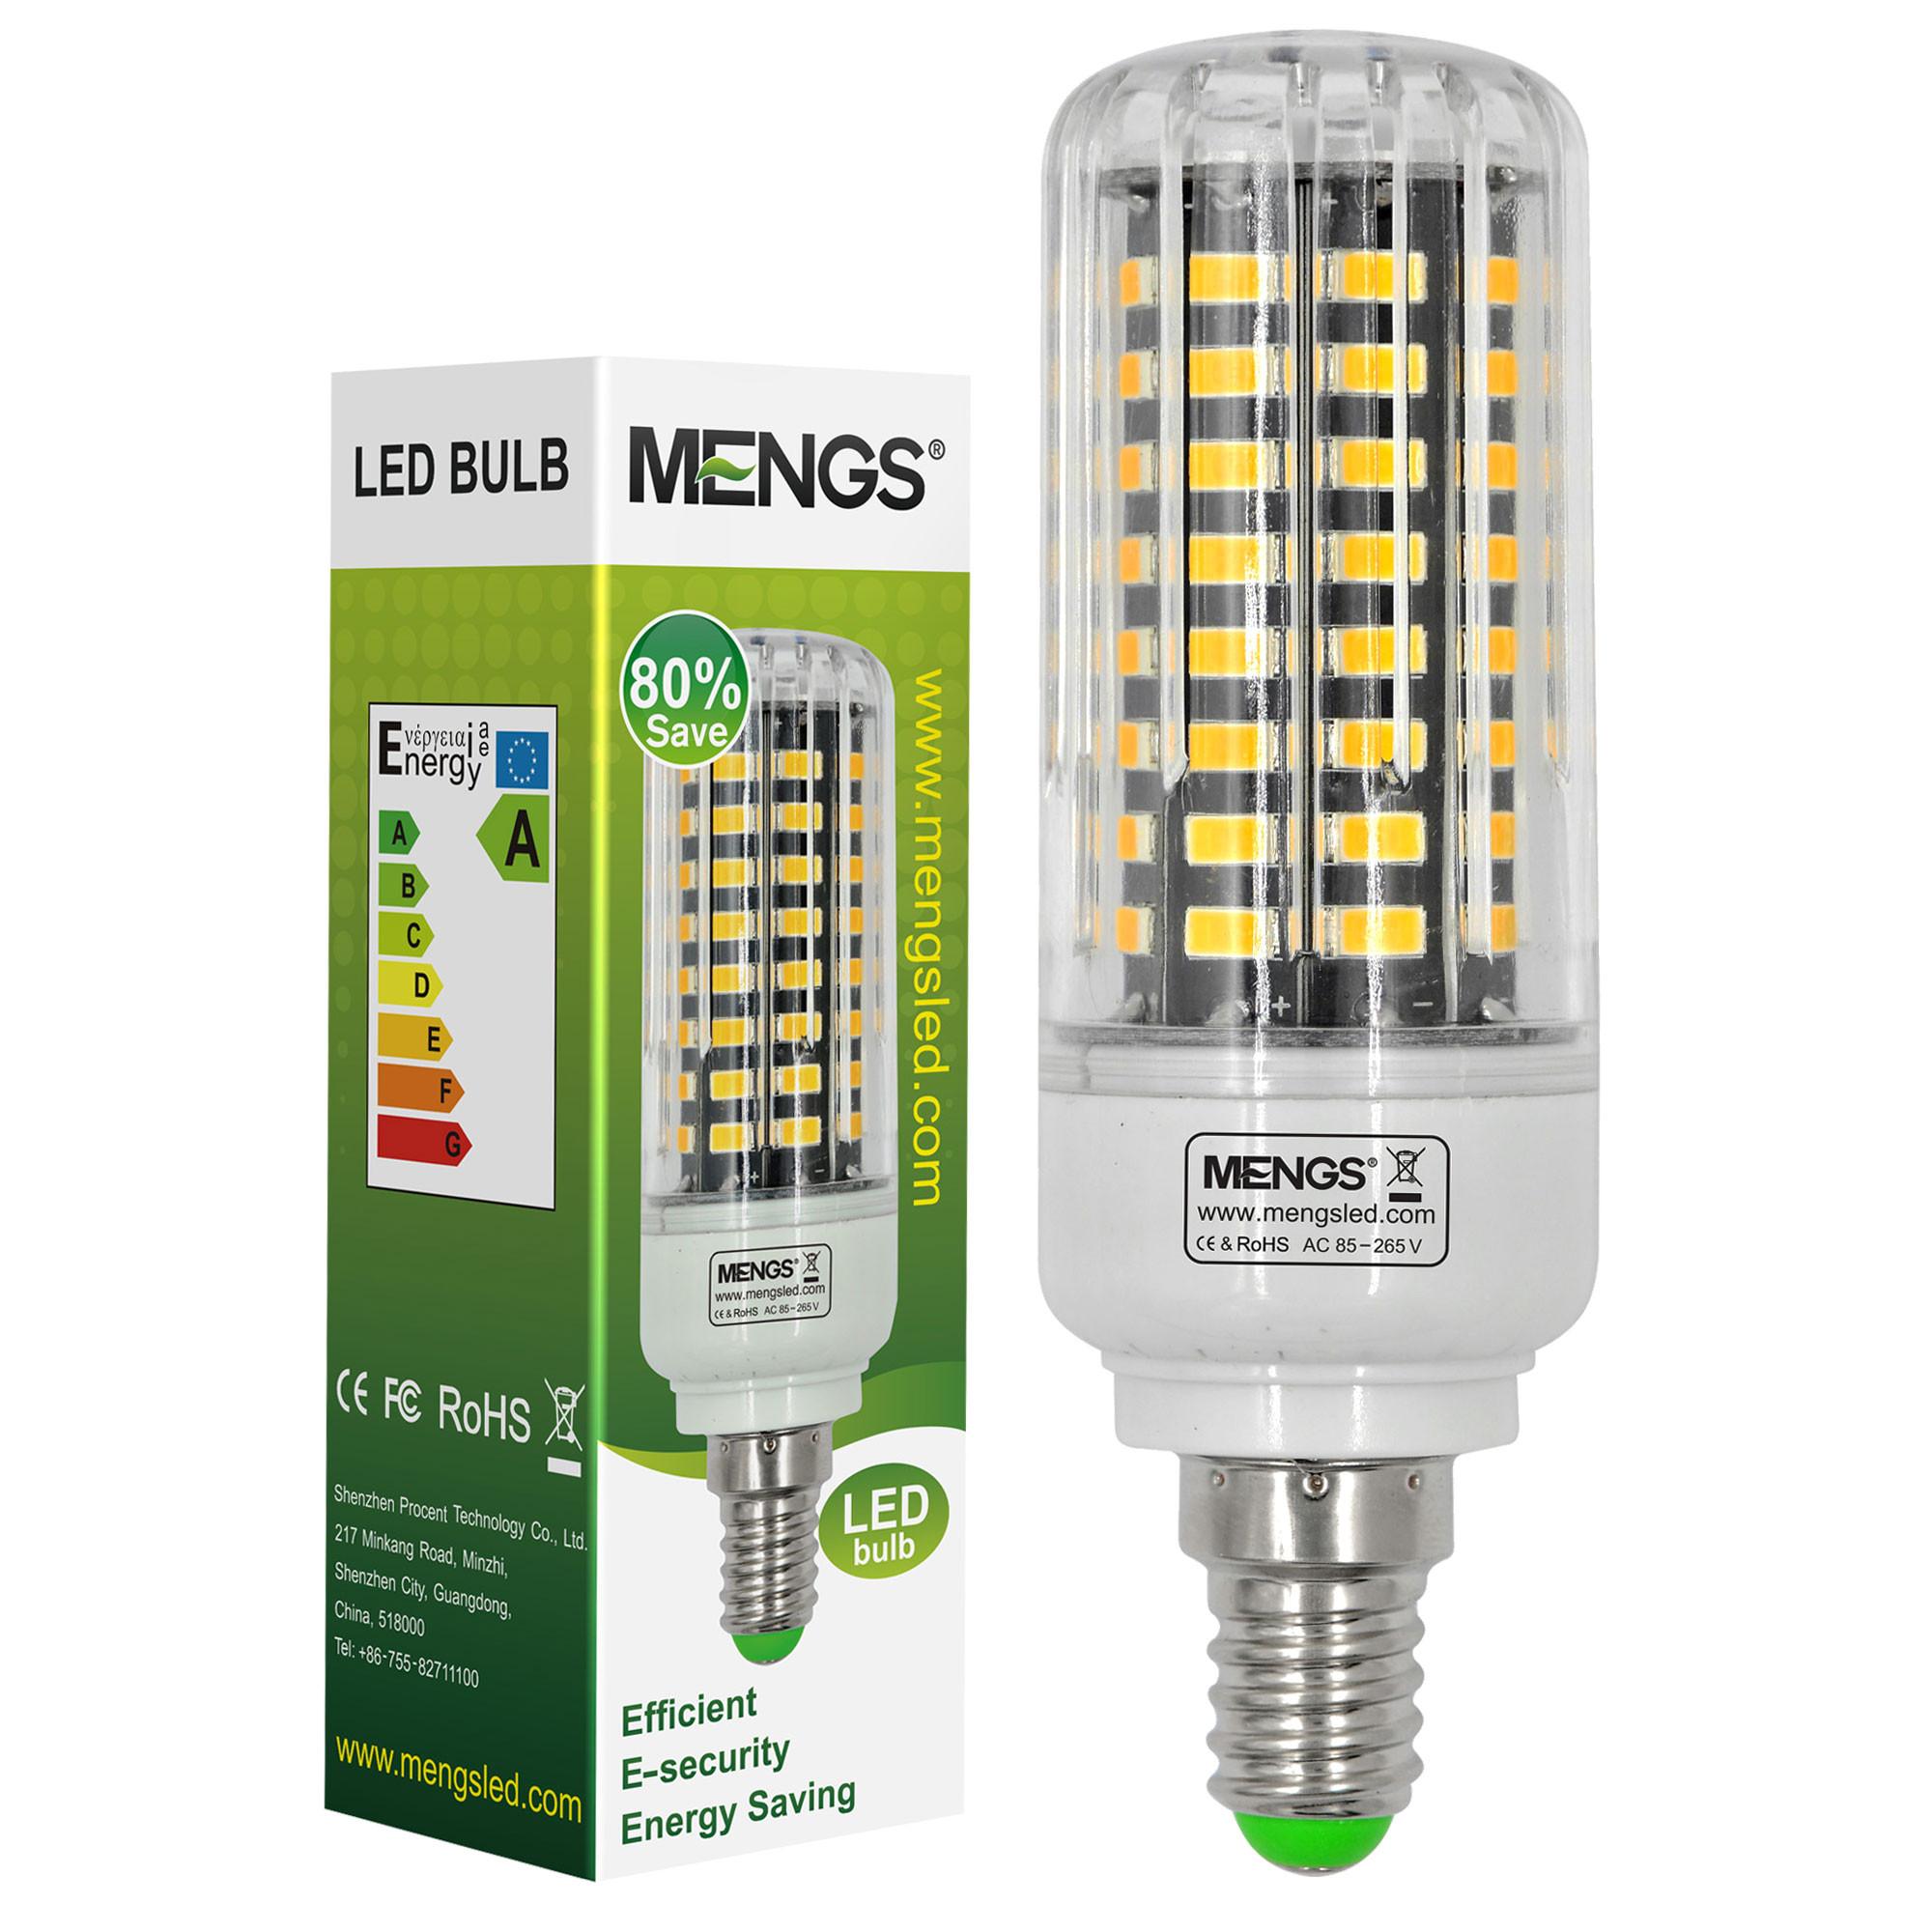 anti strobe e14 9w led corn light 72x 5736 smd led bulb lamp in cool white energy saving lamp. Black Bedroom Furniture Sets. Home Design Ideas